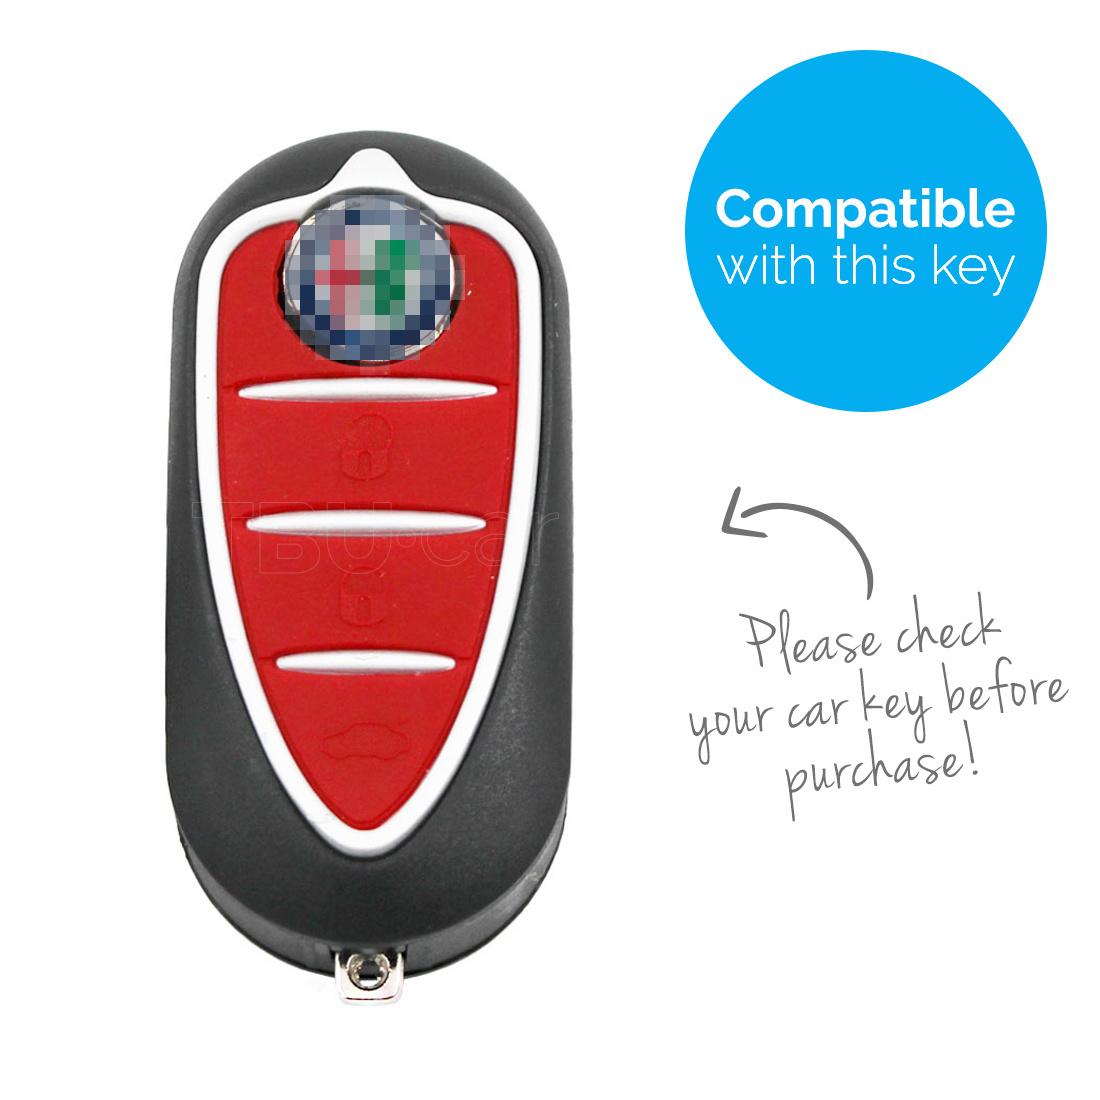 TBU car TBU car Sleutel cover compatibel met Alfa Romeo - Silicone sleutelhoesje - beschermhoesje autosleutel - Oranje